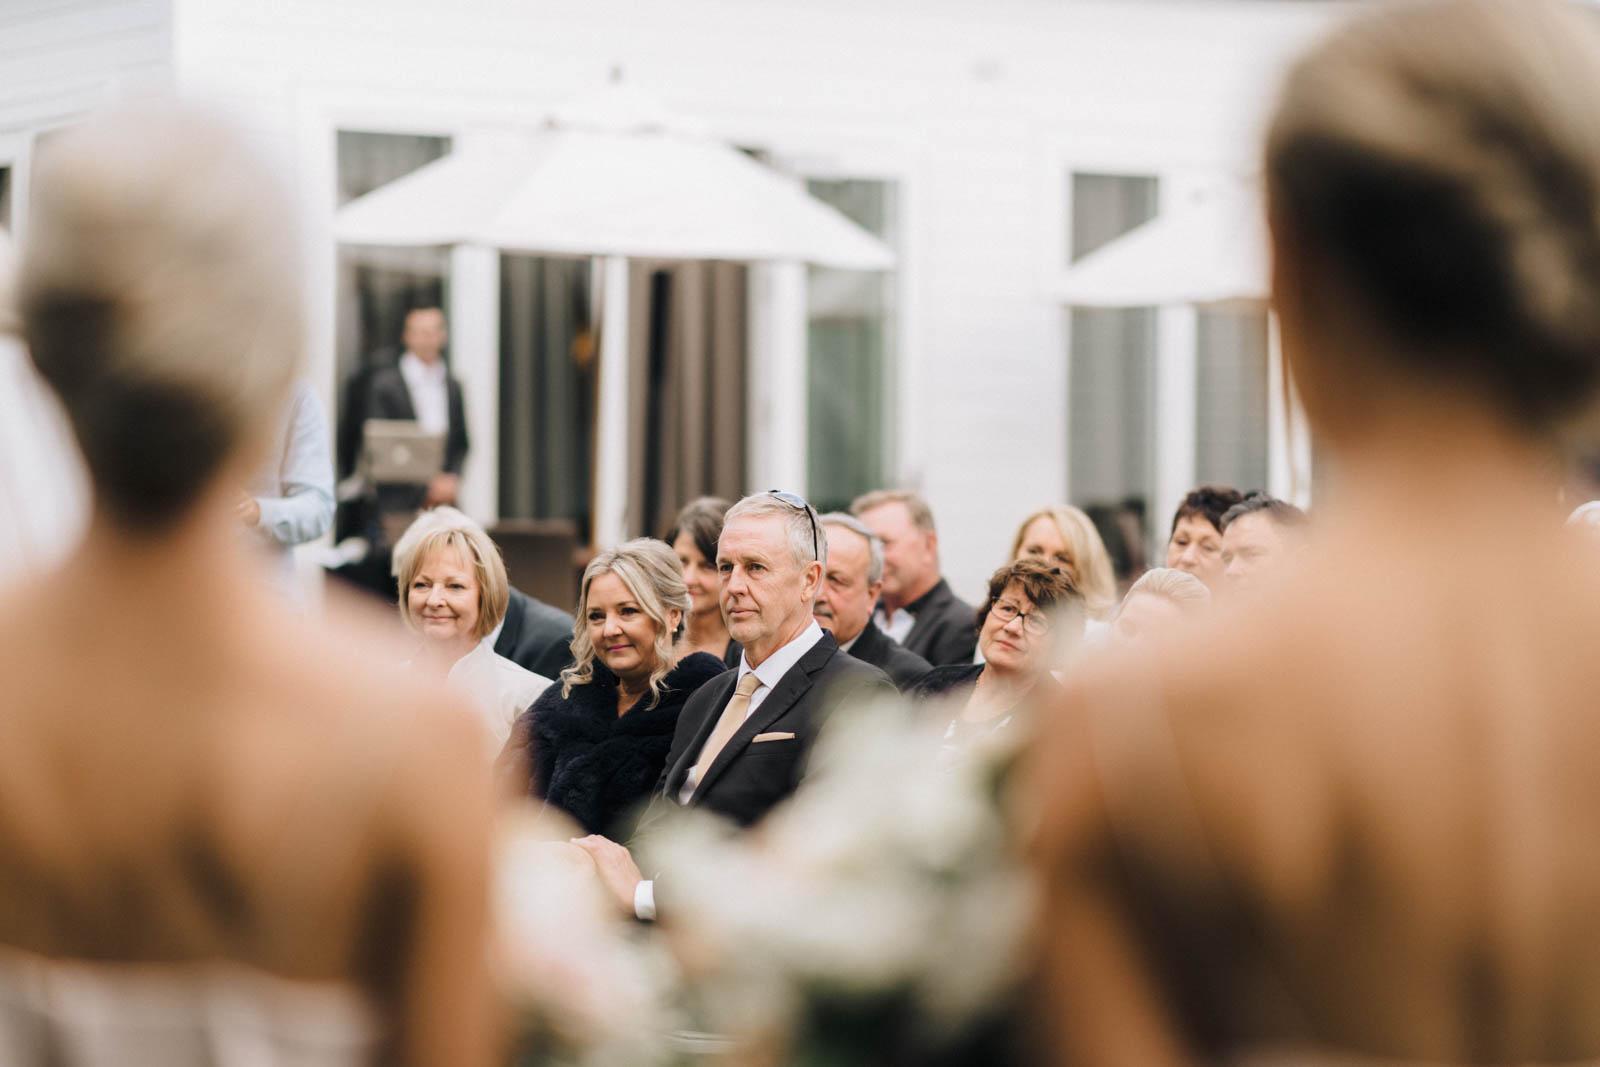 newfound-k-s-hilton-taupo-wedding-photographer-036